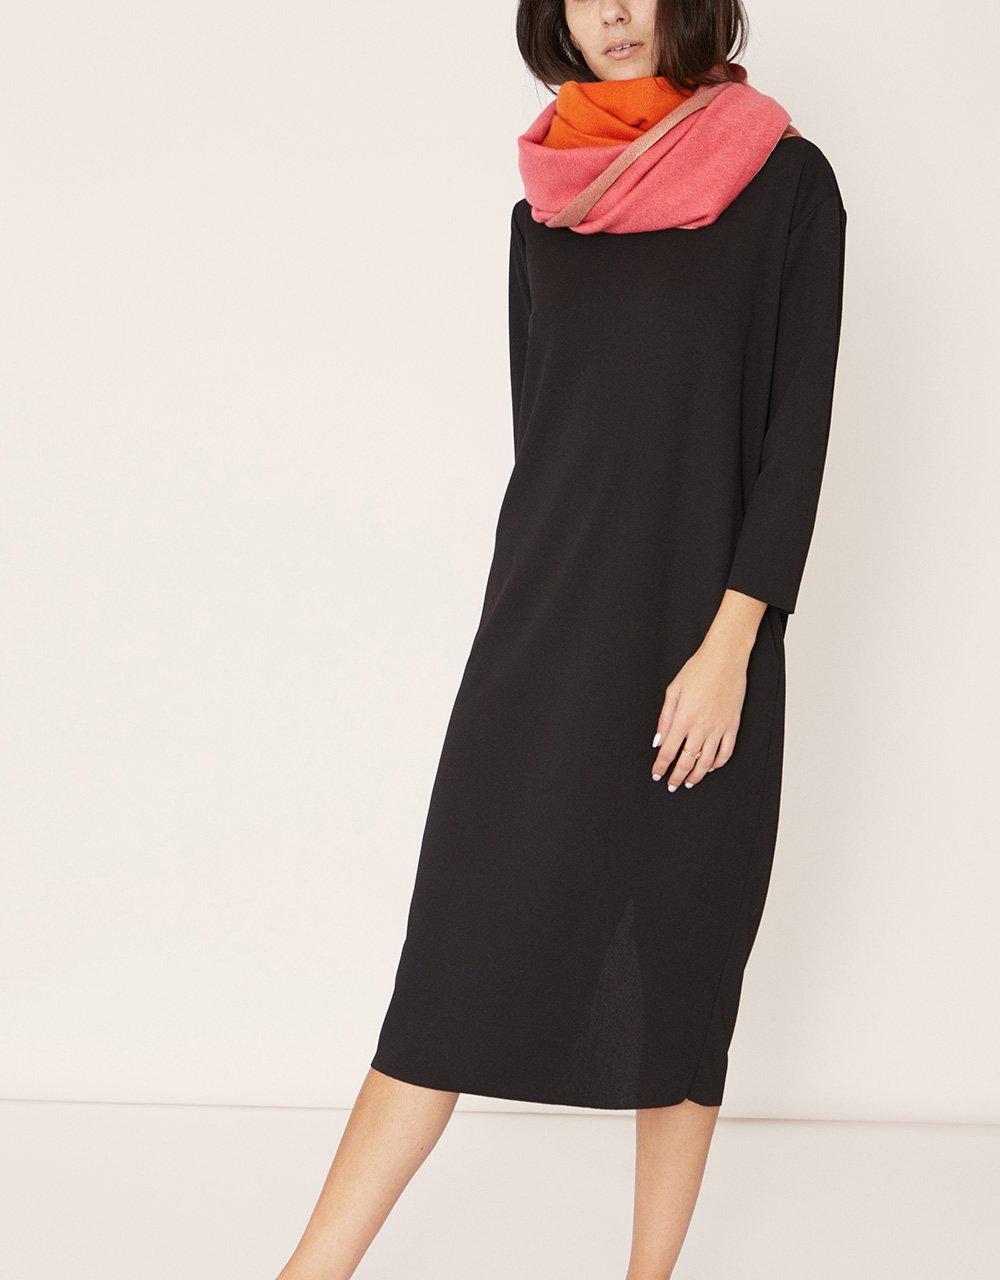 foulard02f